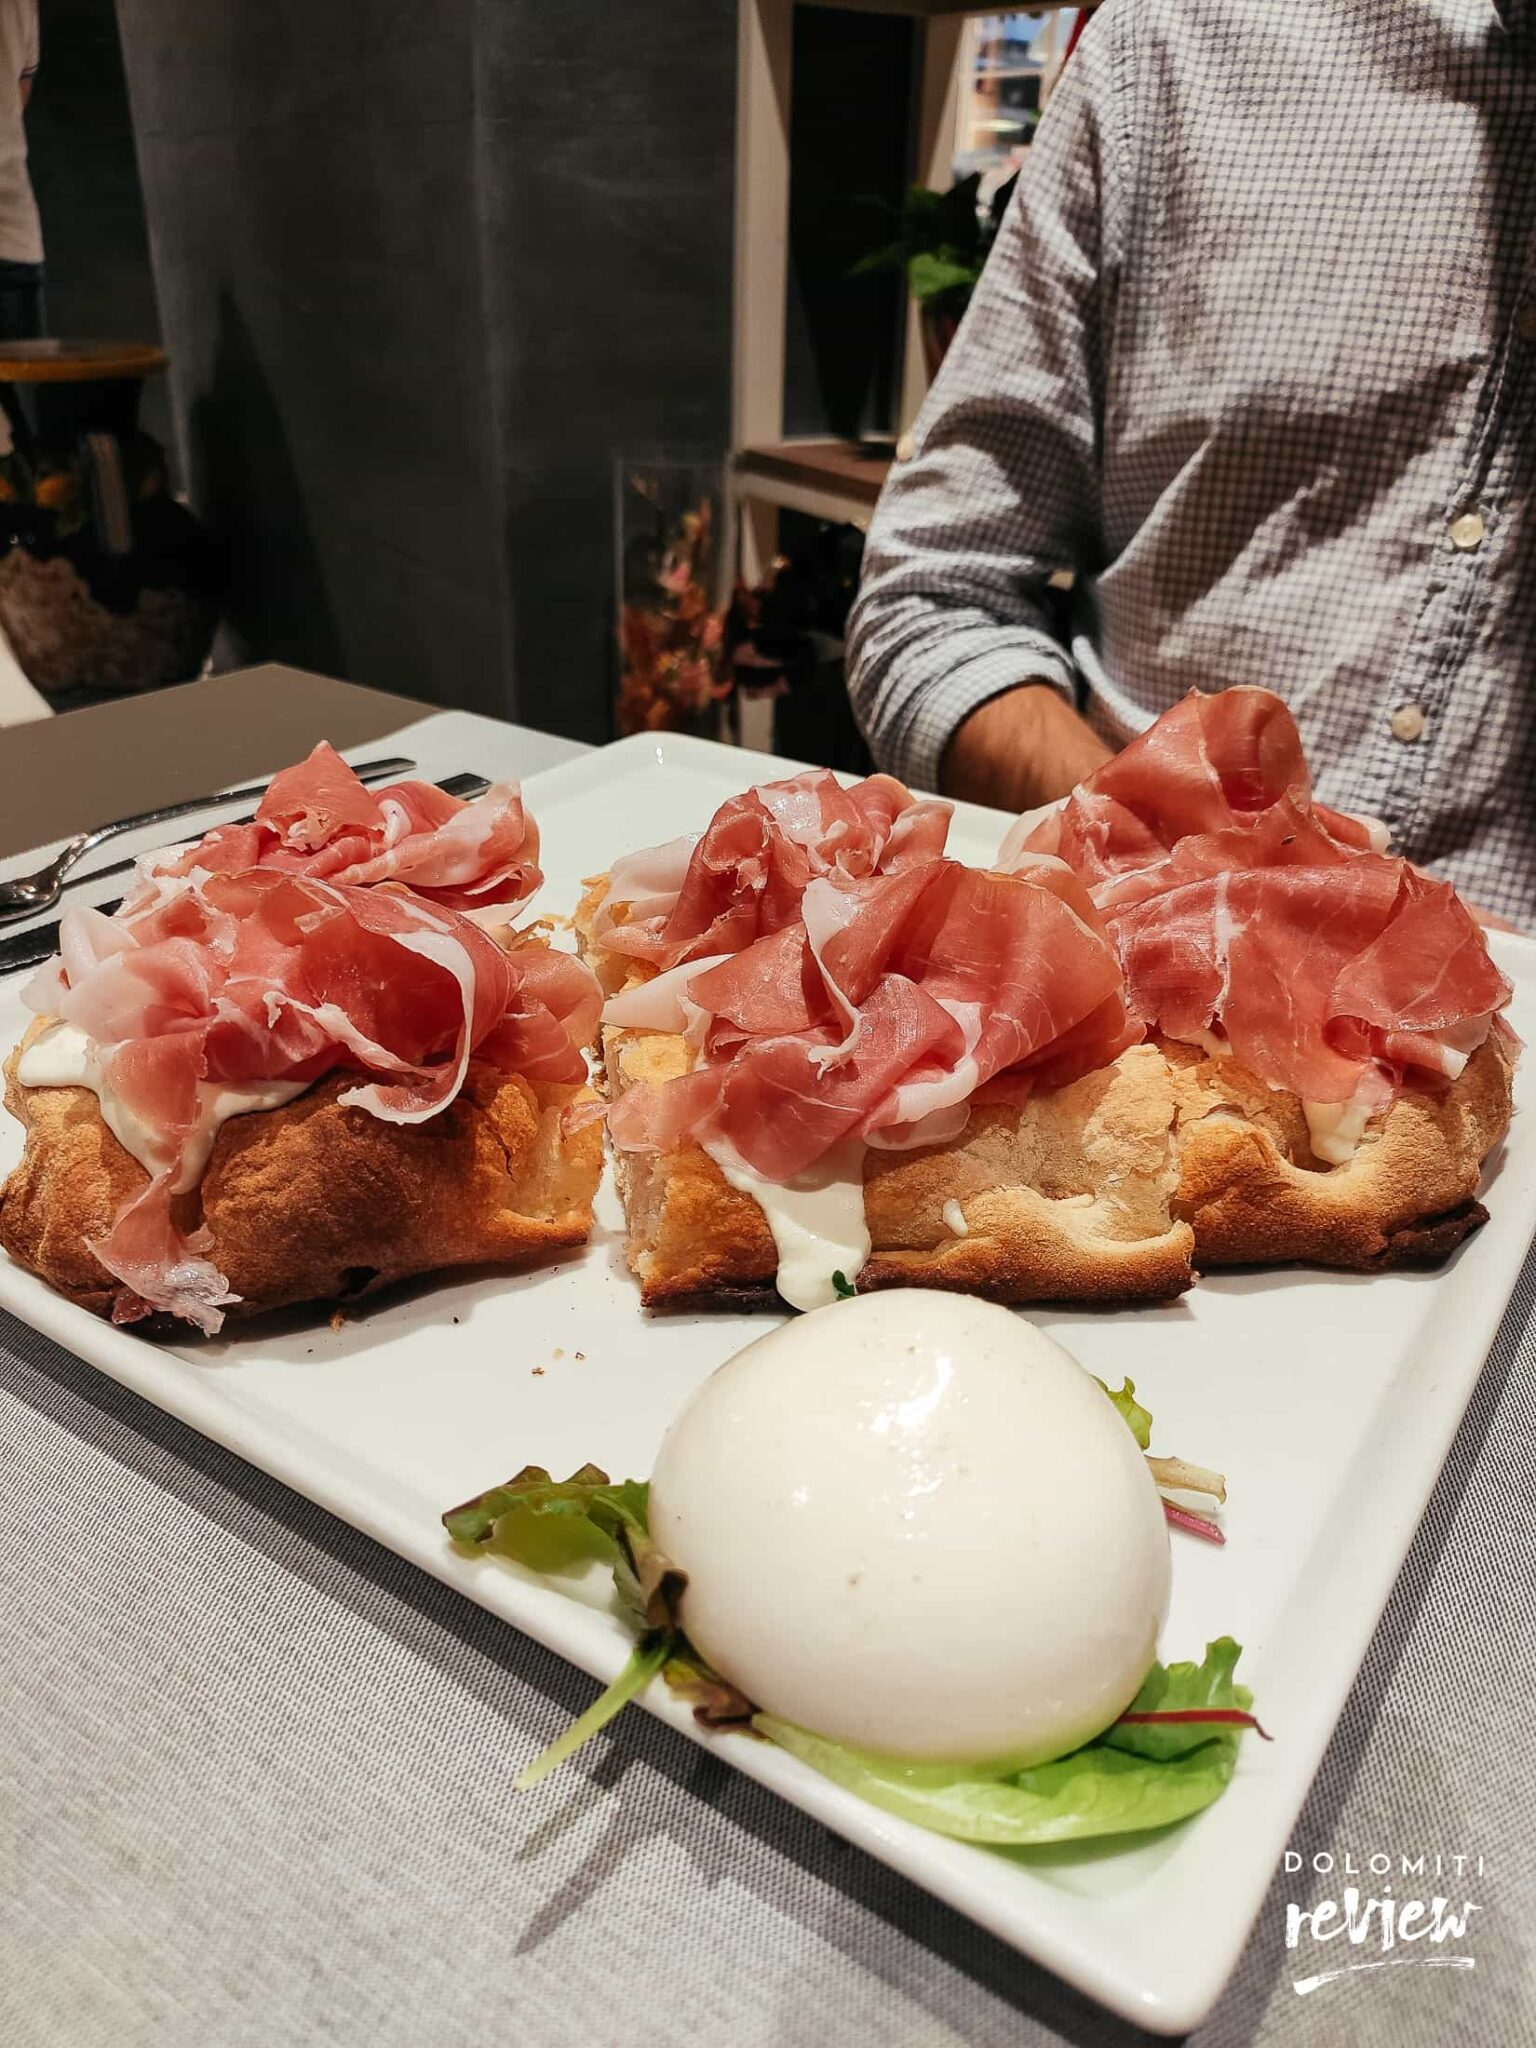 Nuvola - Pizzeria La Fenice